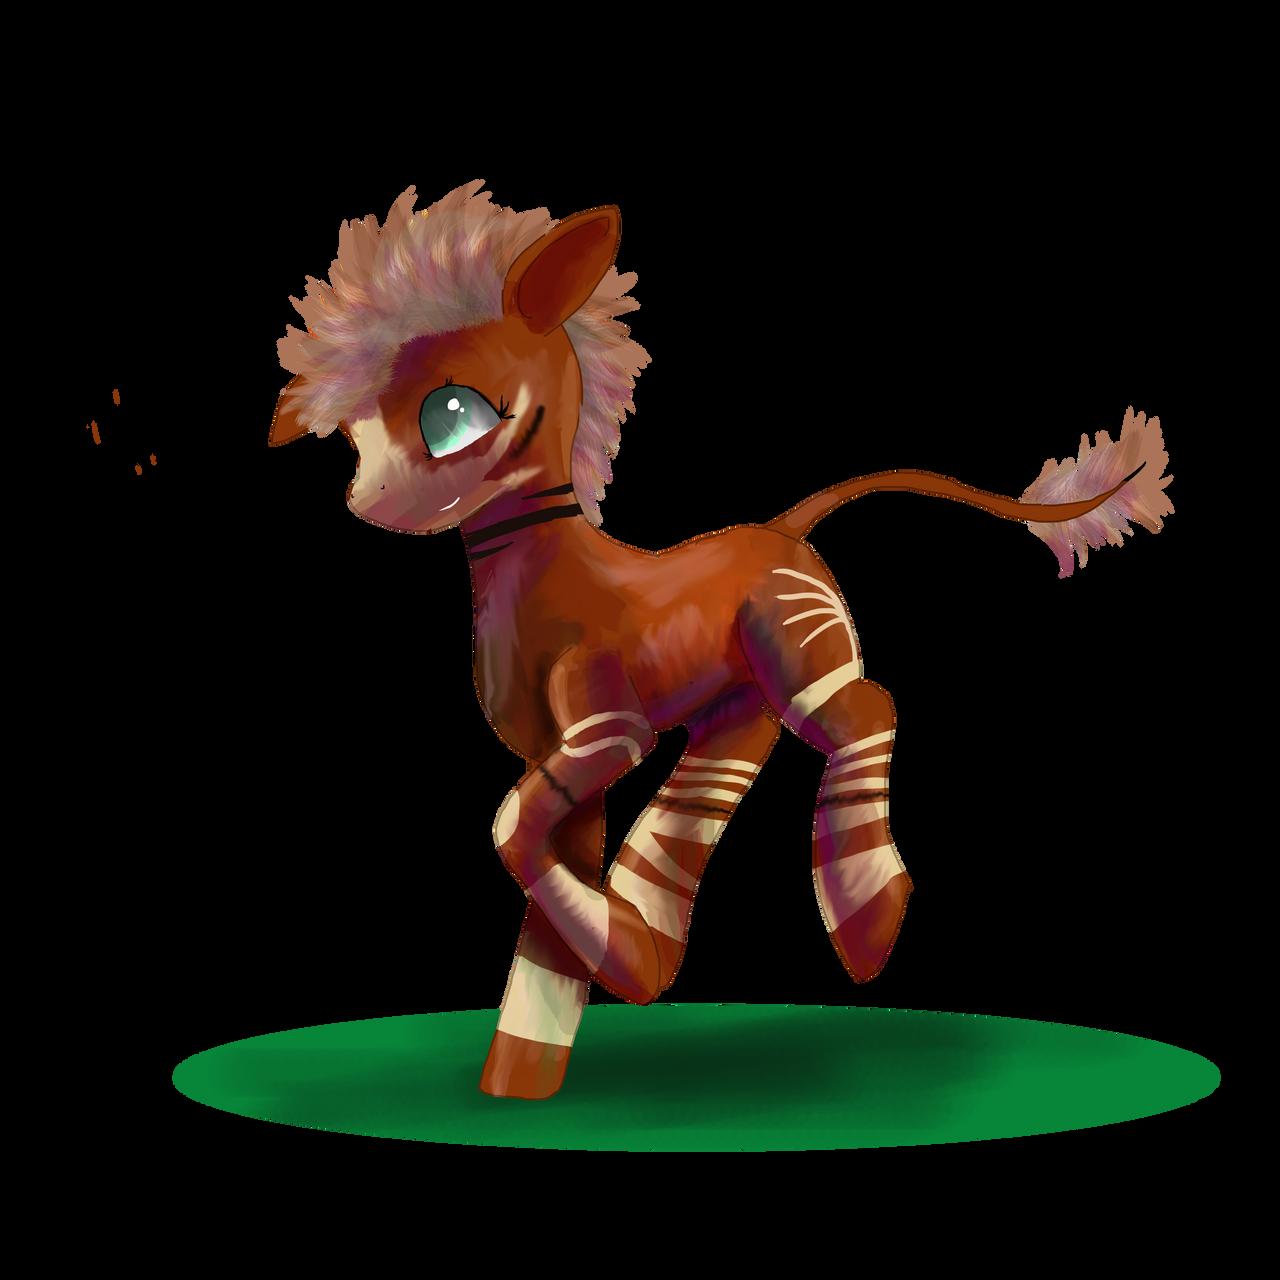 a Okapi by SuperRobotRainbowPig